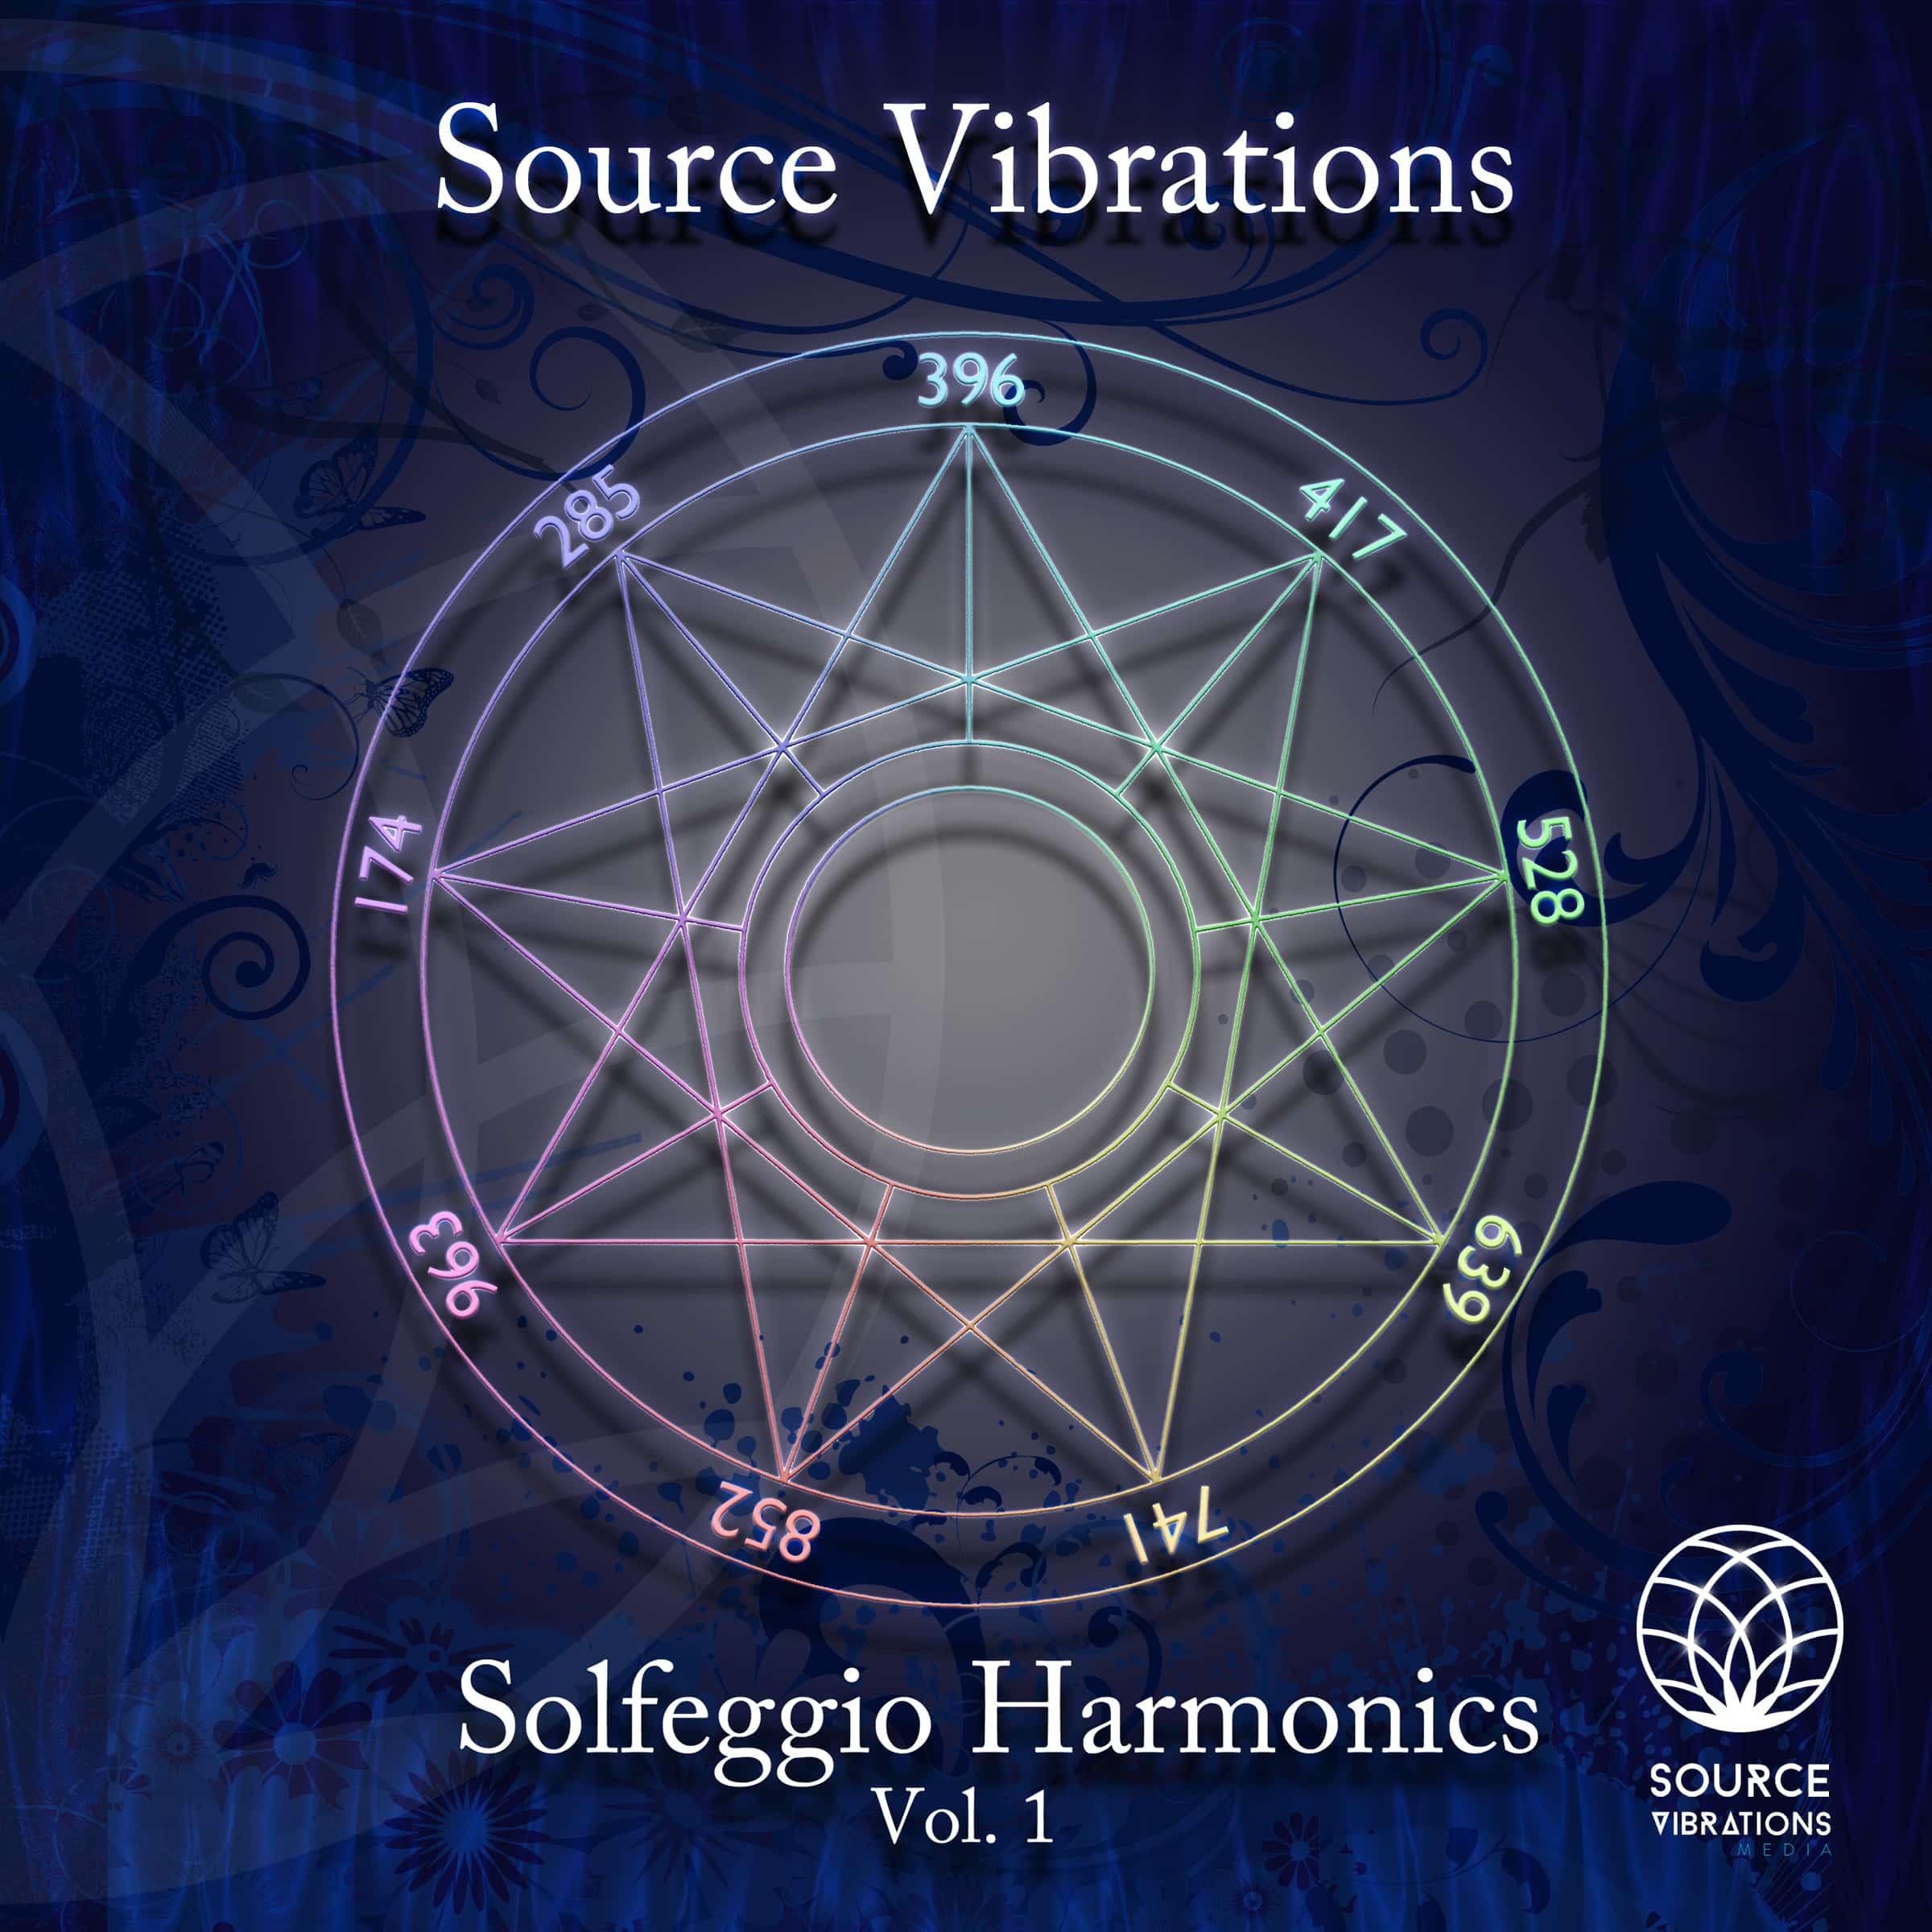 Solfeggio Harmonics Vol 1